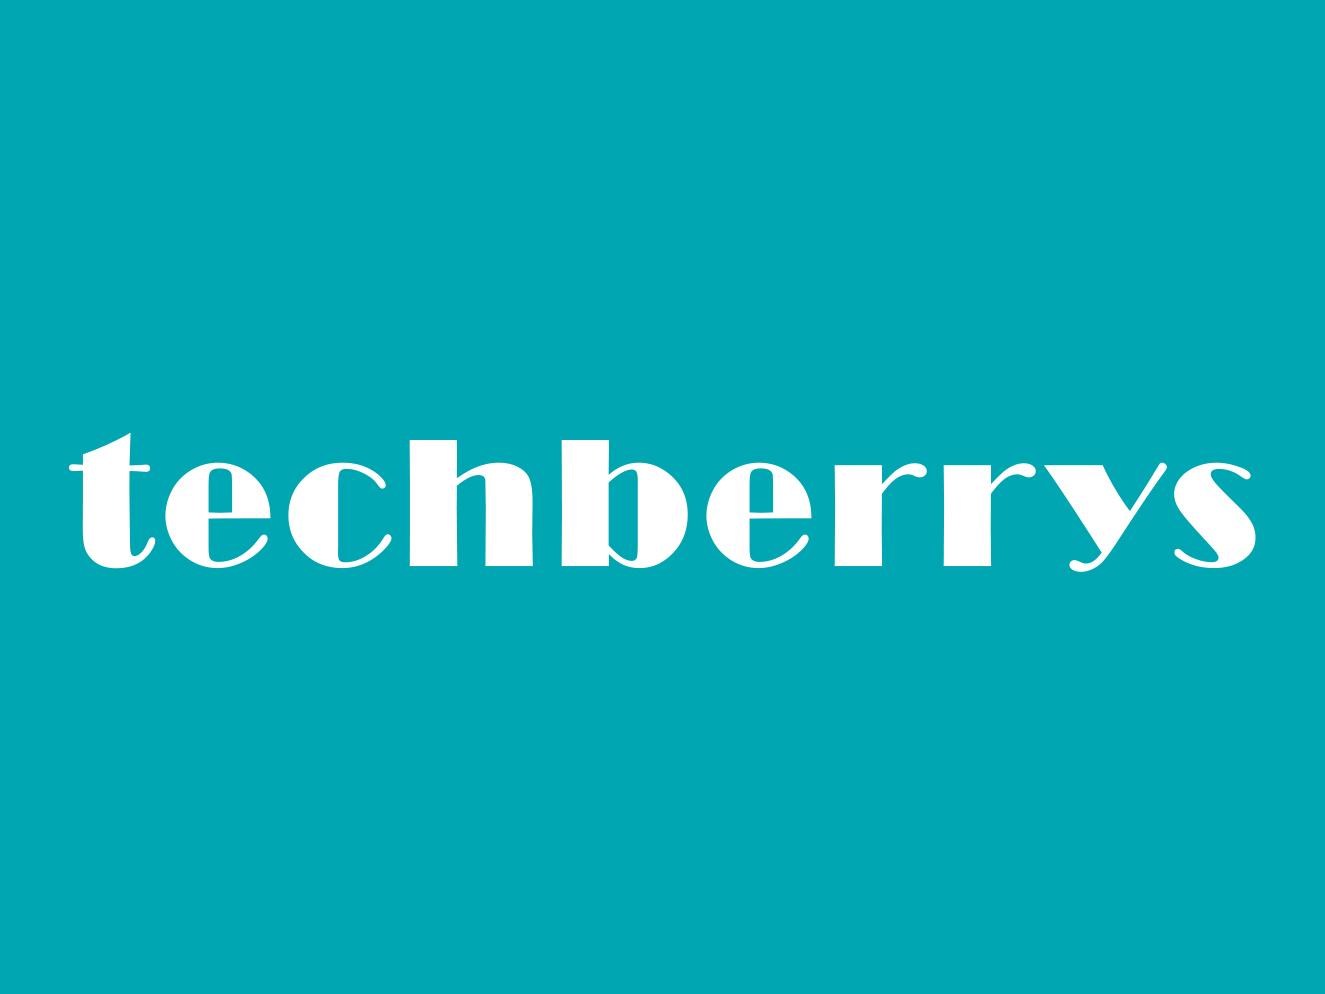 Techberrys typogaphy minimalist logo logo design logo berries berry tech tech logo